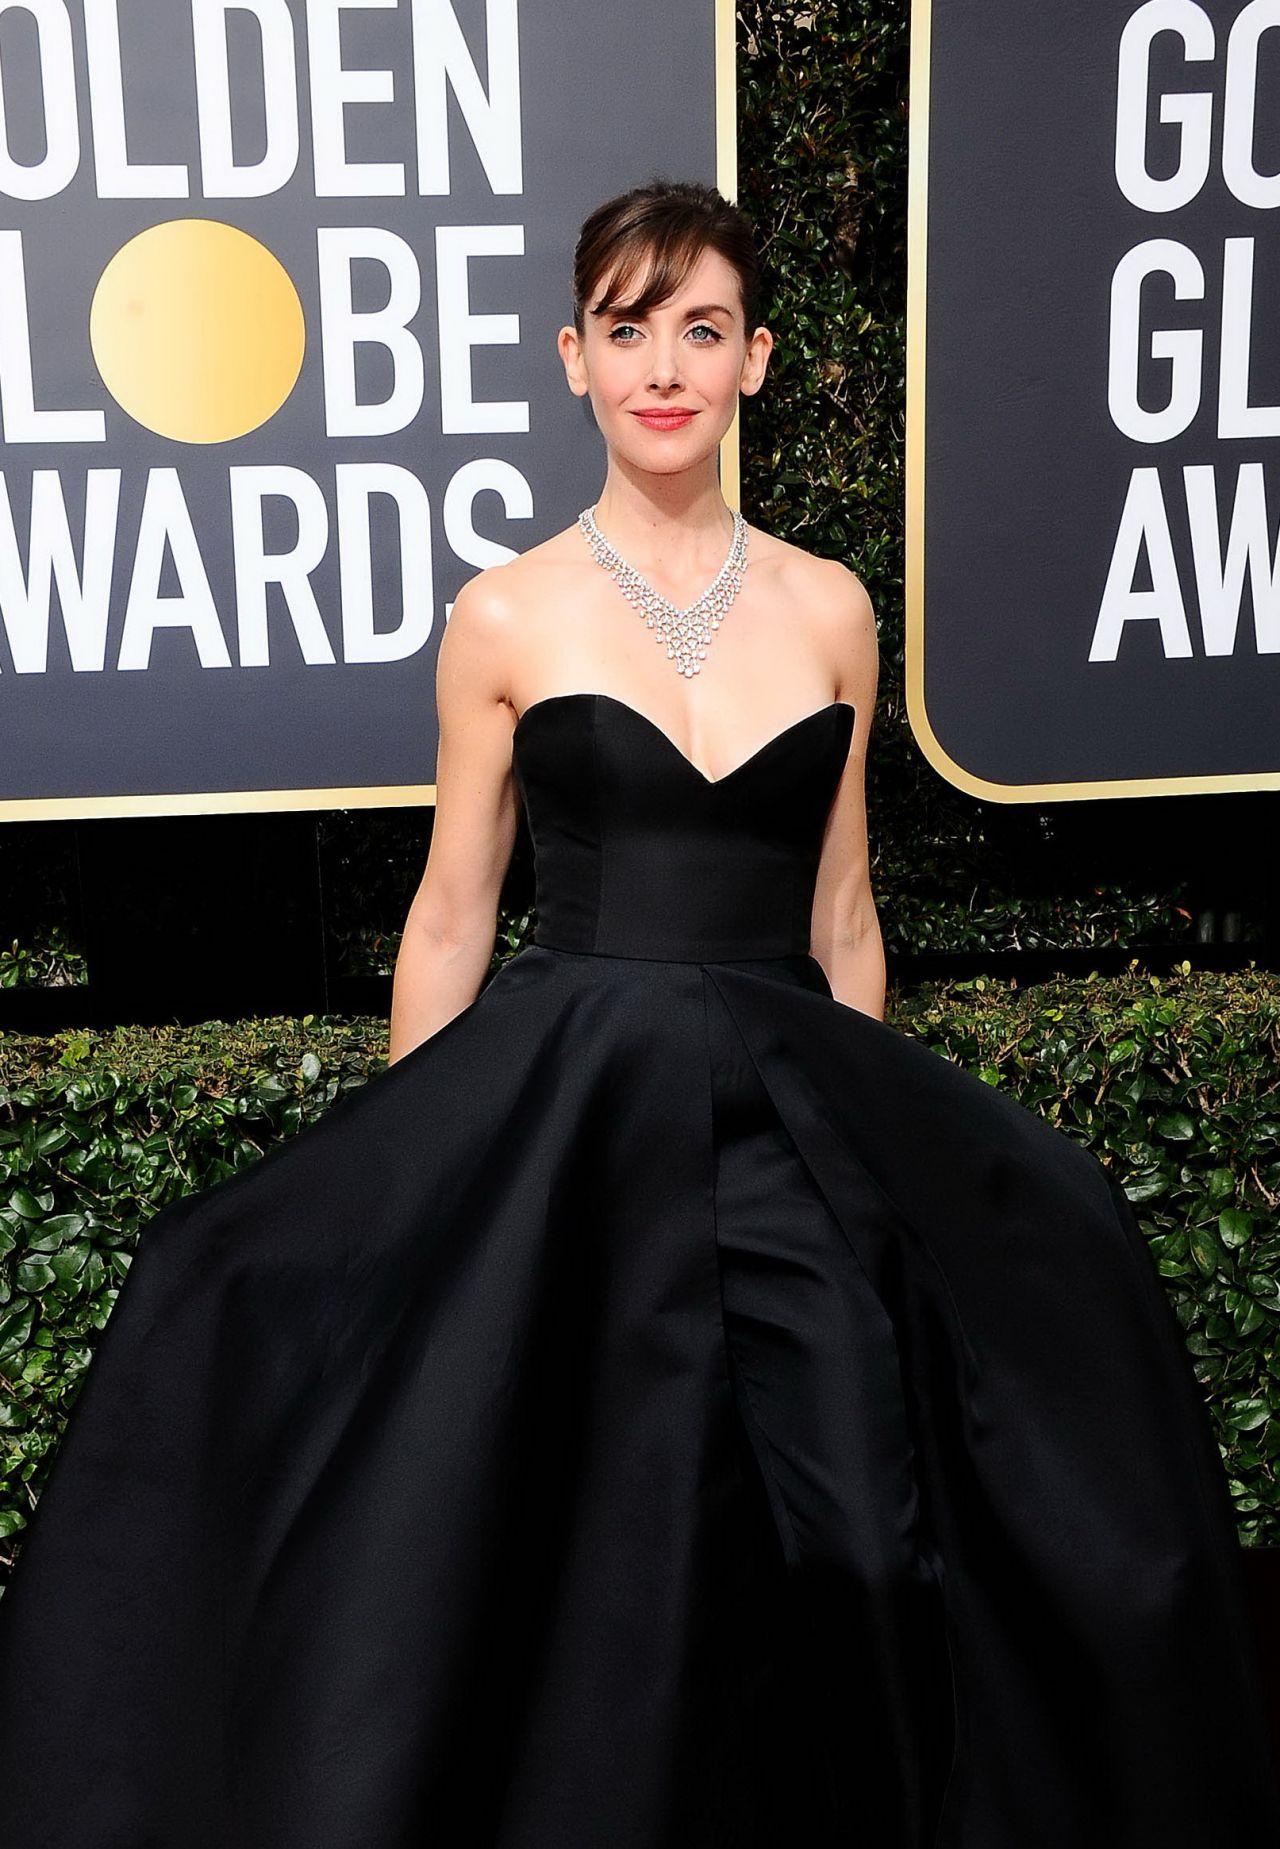 Alison Brie Golden Globe Awards 2018